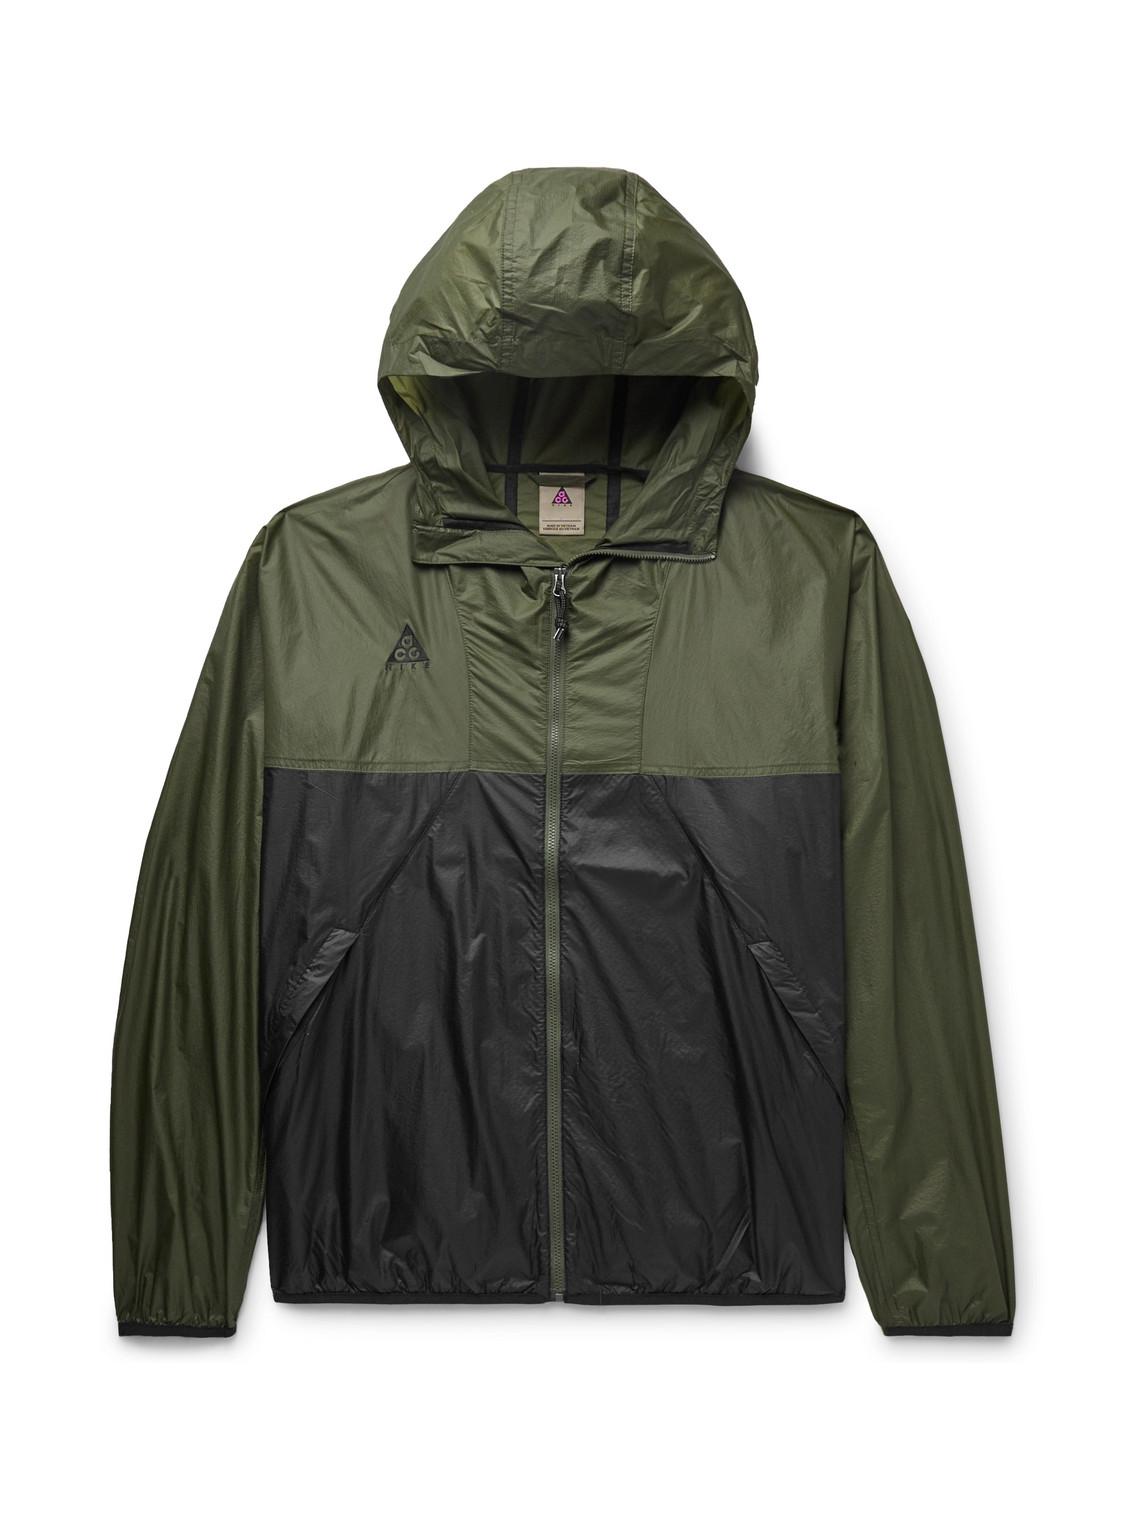 Nike - Acg Nrg Logo-Embroidered Colour-Block Nylon-Ripstop Hooded Jacket - Men - Black - Xl